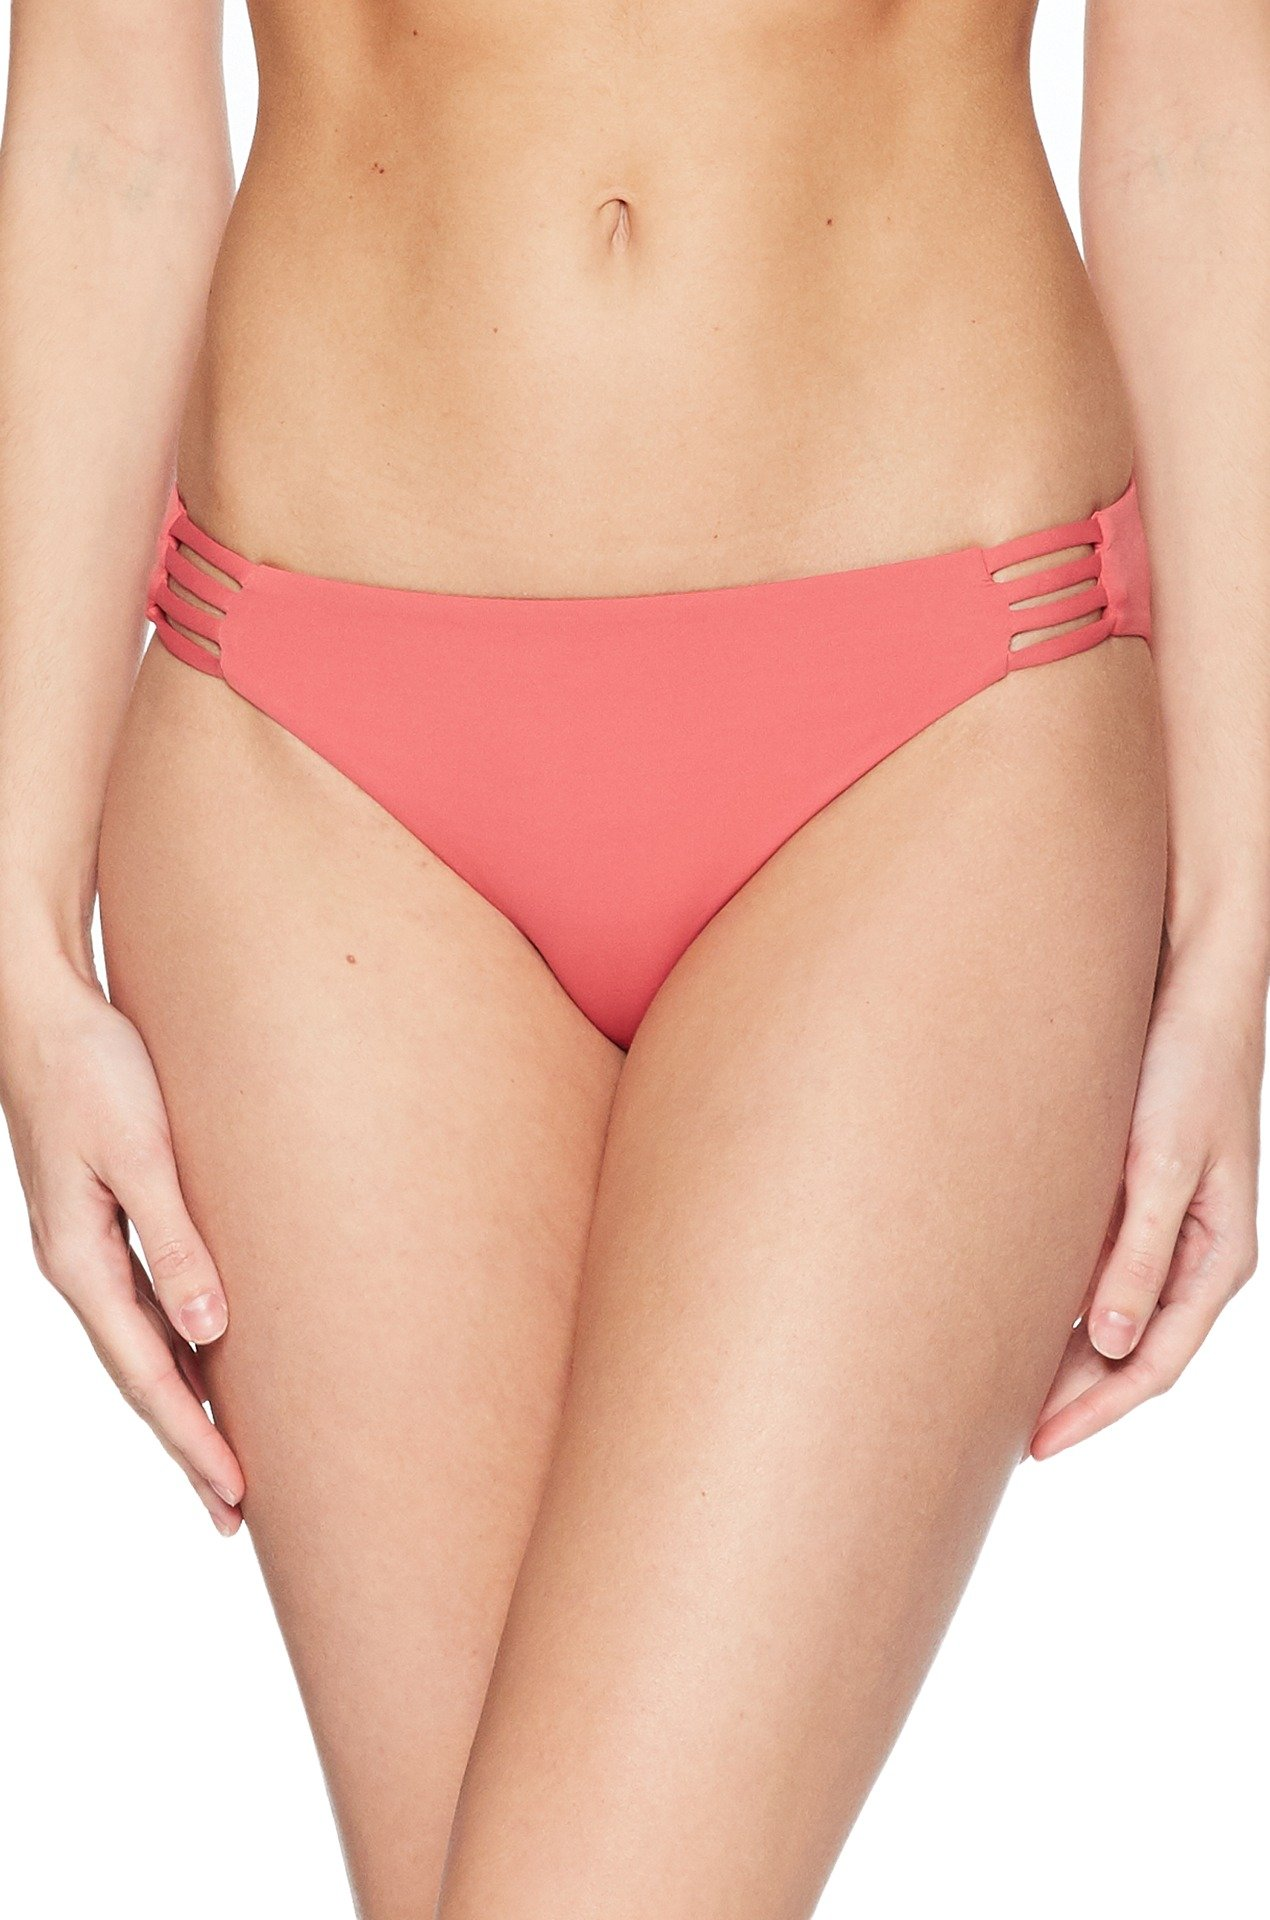 Roxy Women's Solid Softly Love 70s Bikini Bottom, Holly Berry, S